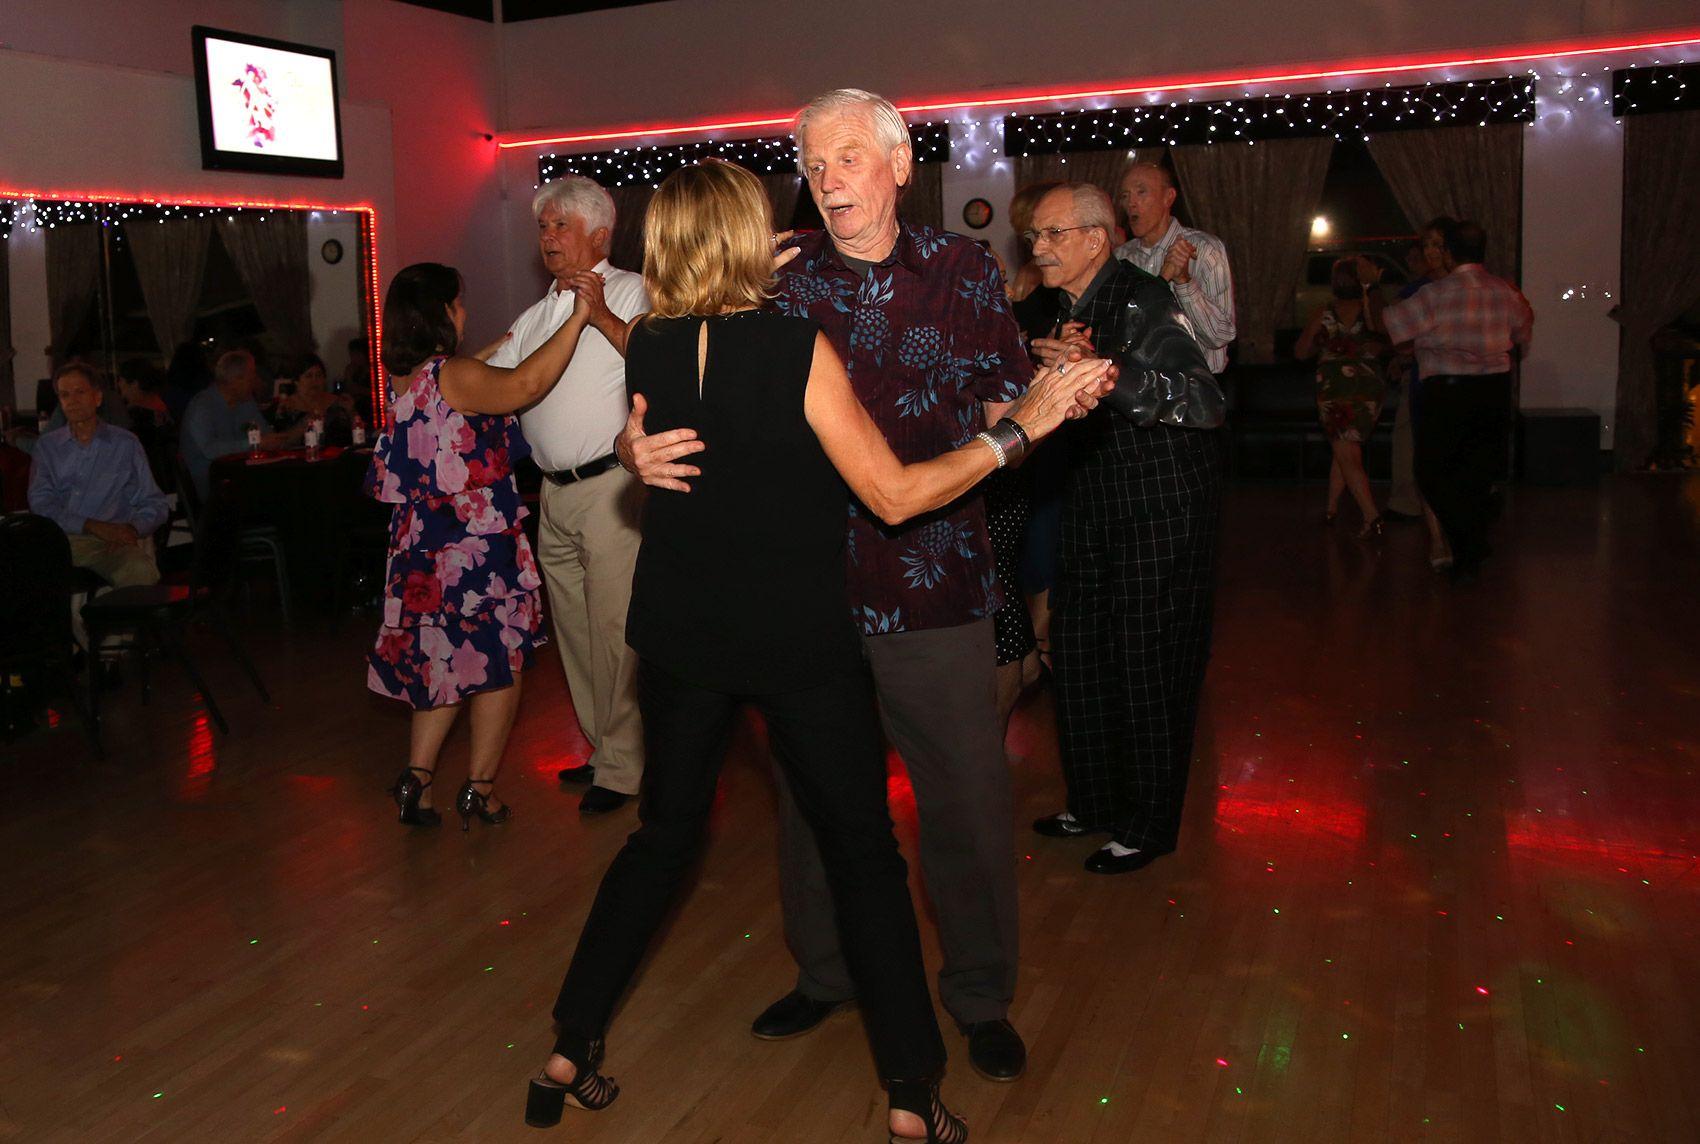 Social Dancers   Ballroom dancing, Partner dance, Ballroom dance